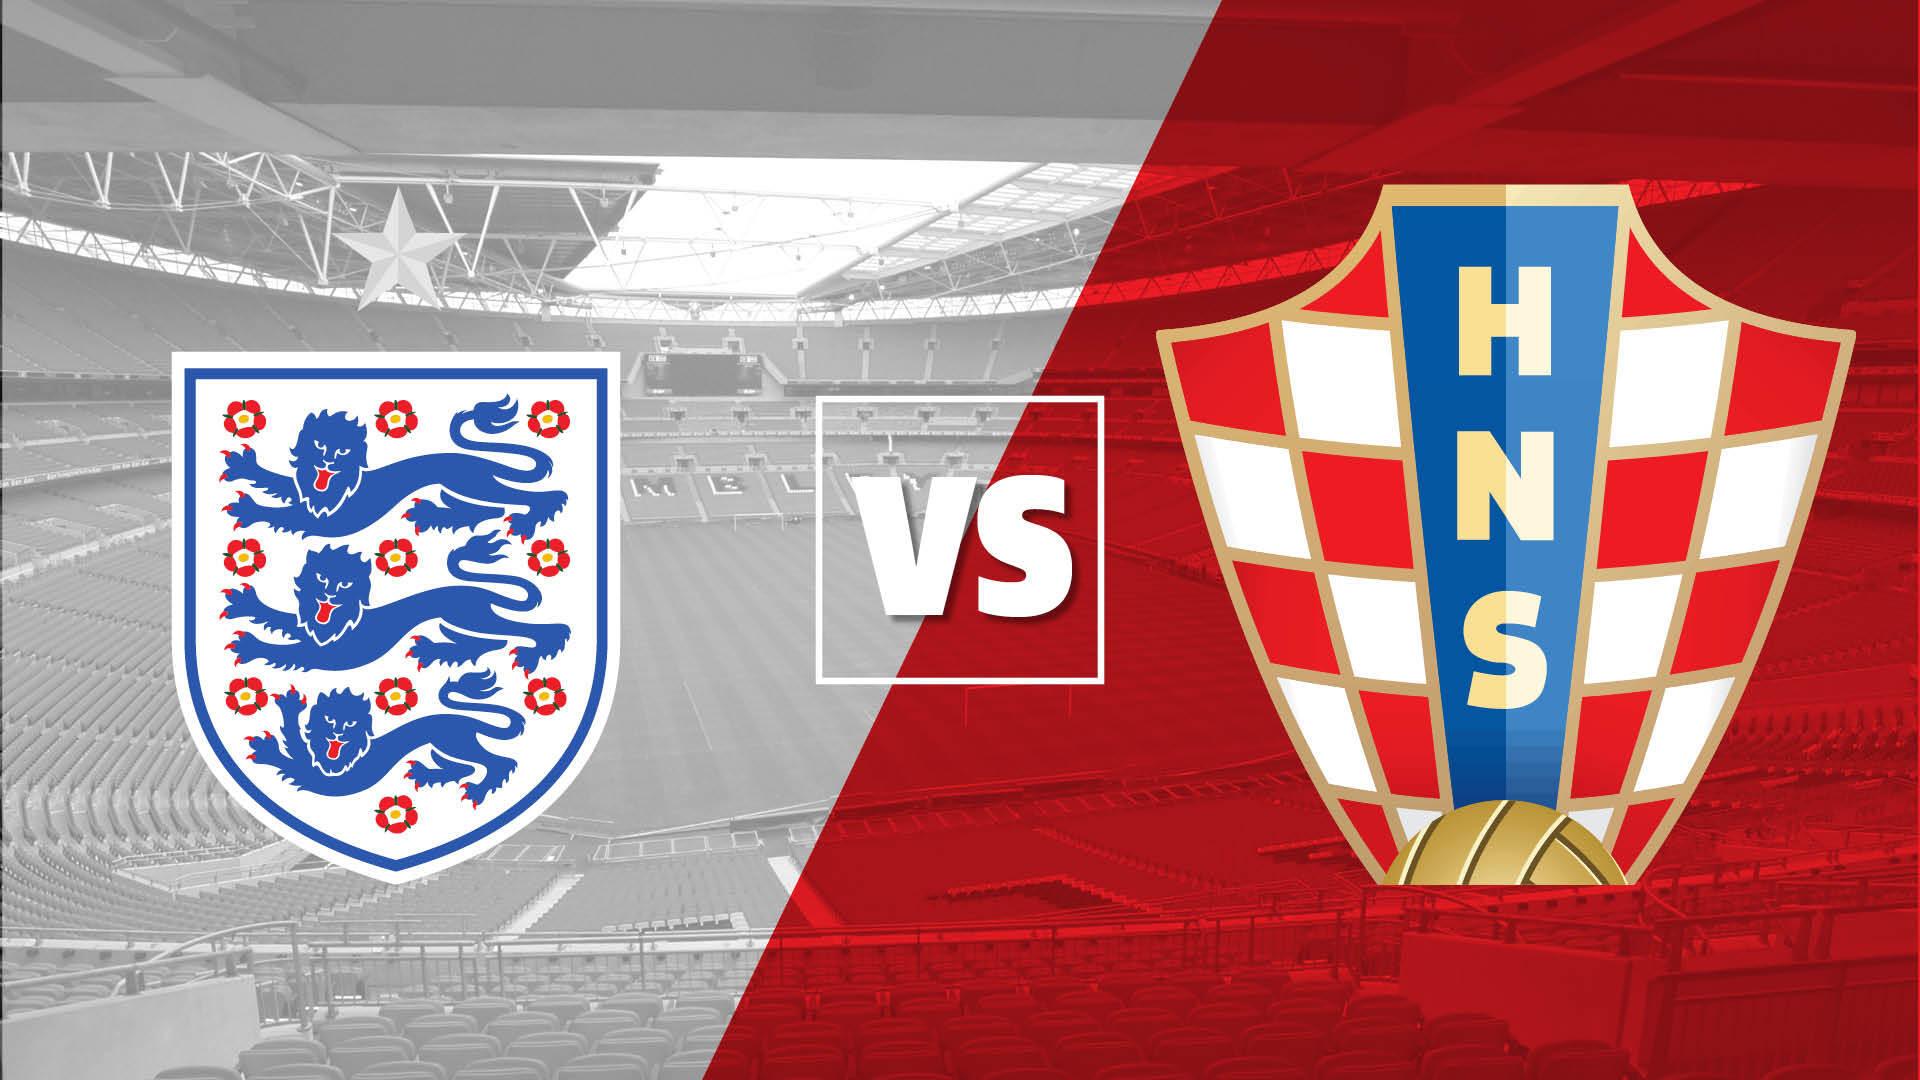 England vs Croatia: How to watch and live stream around the world